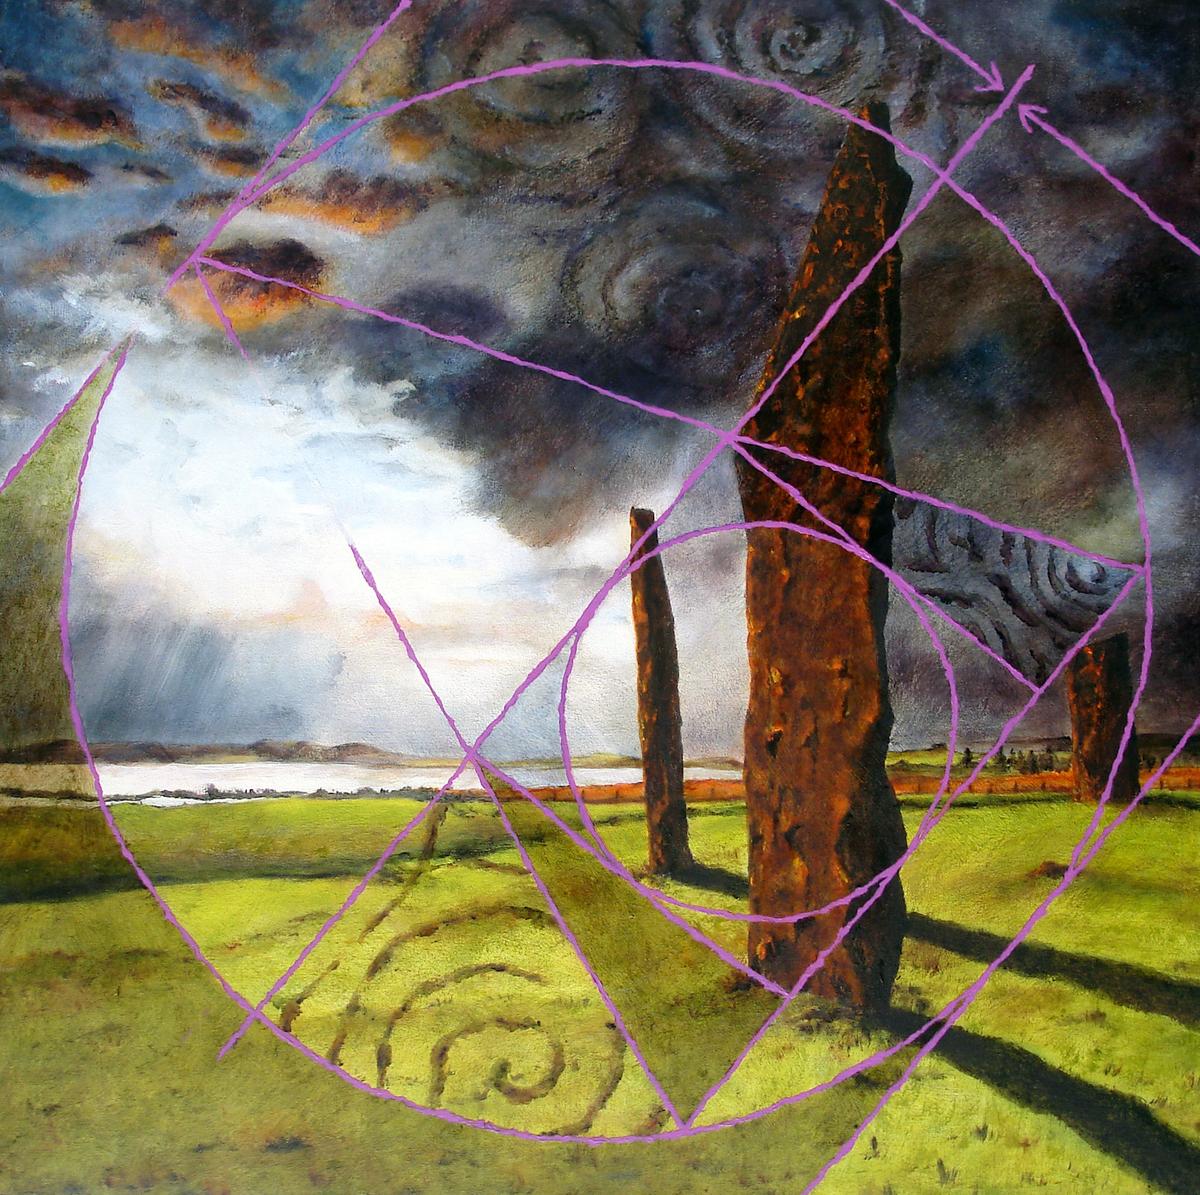 Philosopher's Stone (large view)